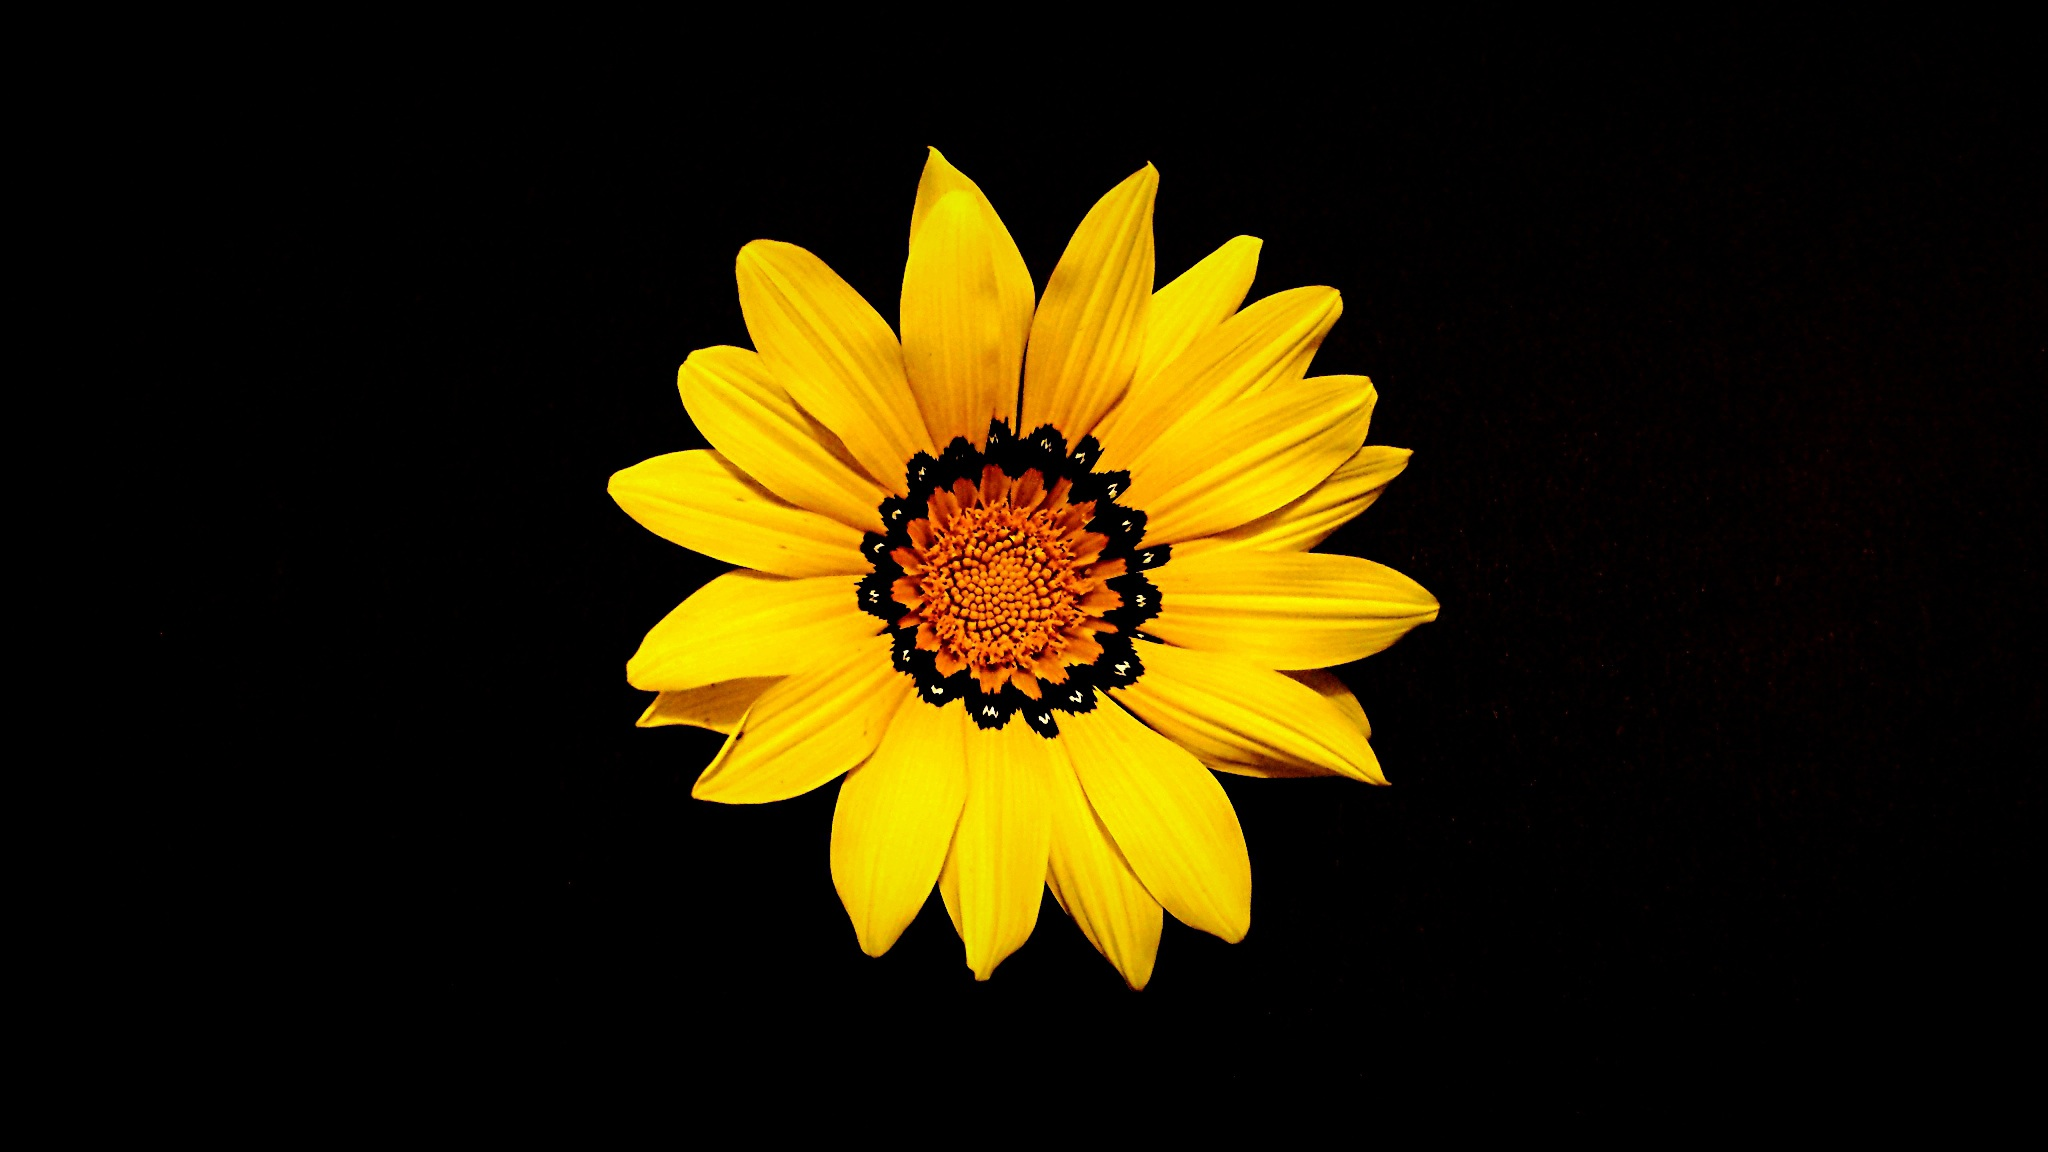 Yellow Bright Flower On Black Background Free Image